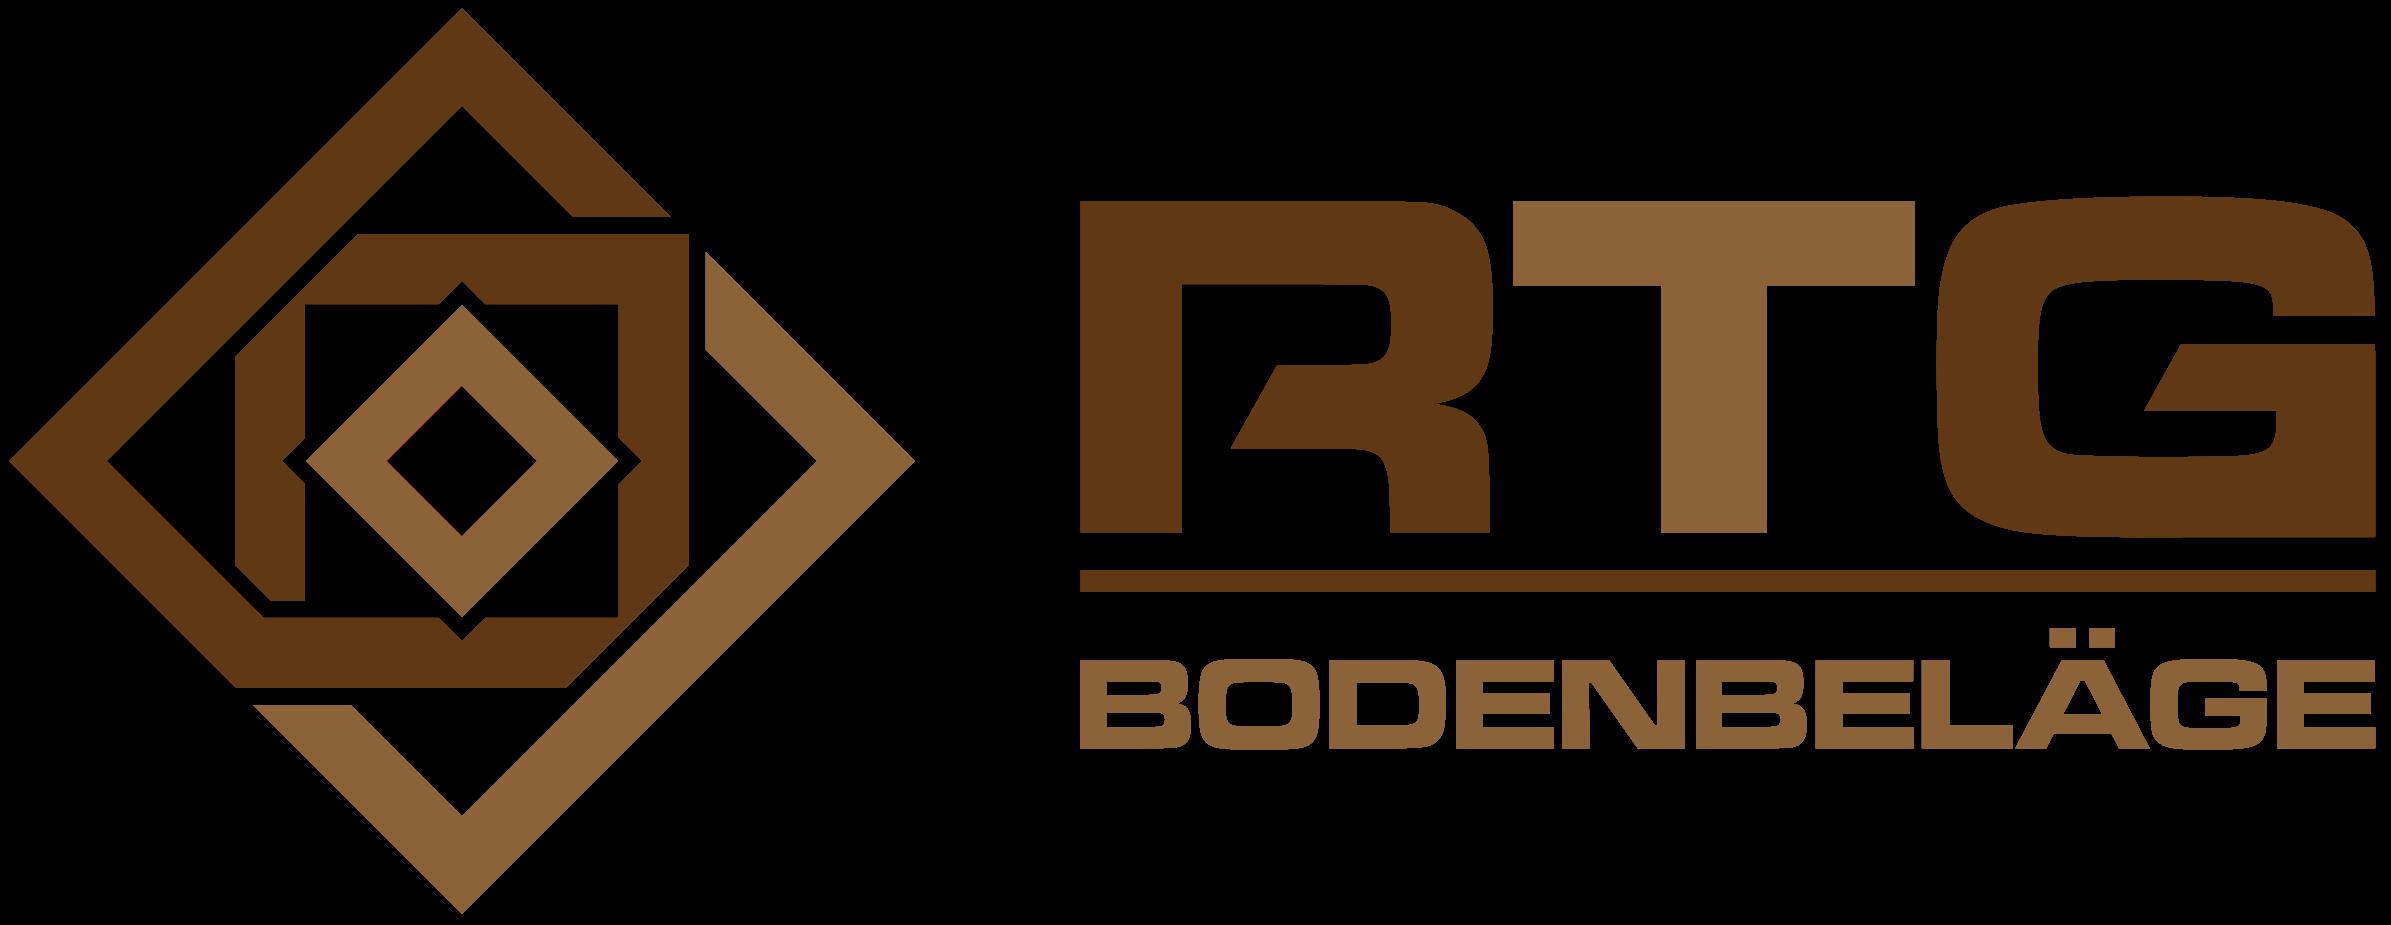 RTG Bodenbeläge